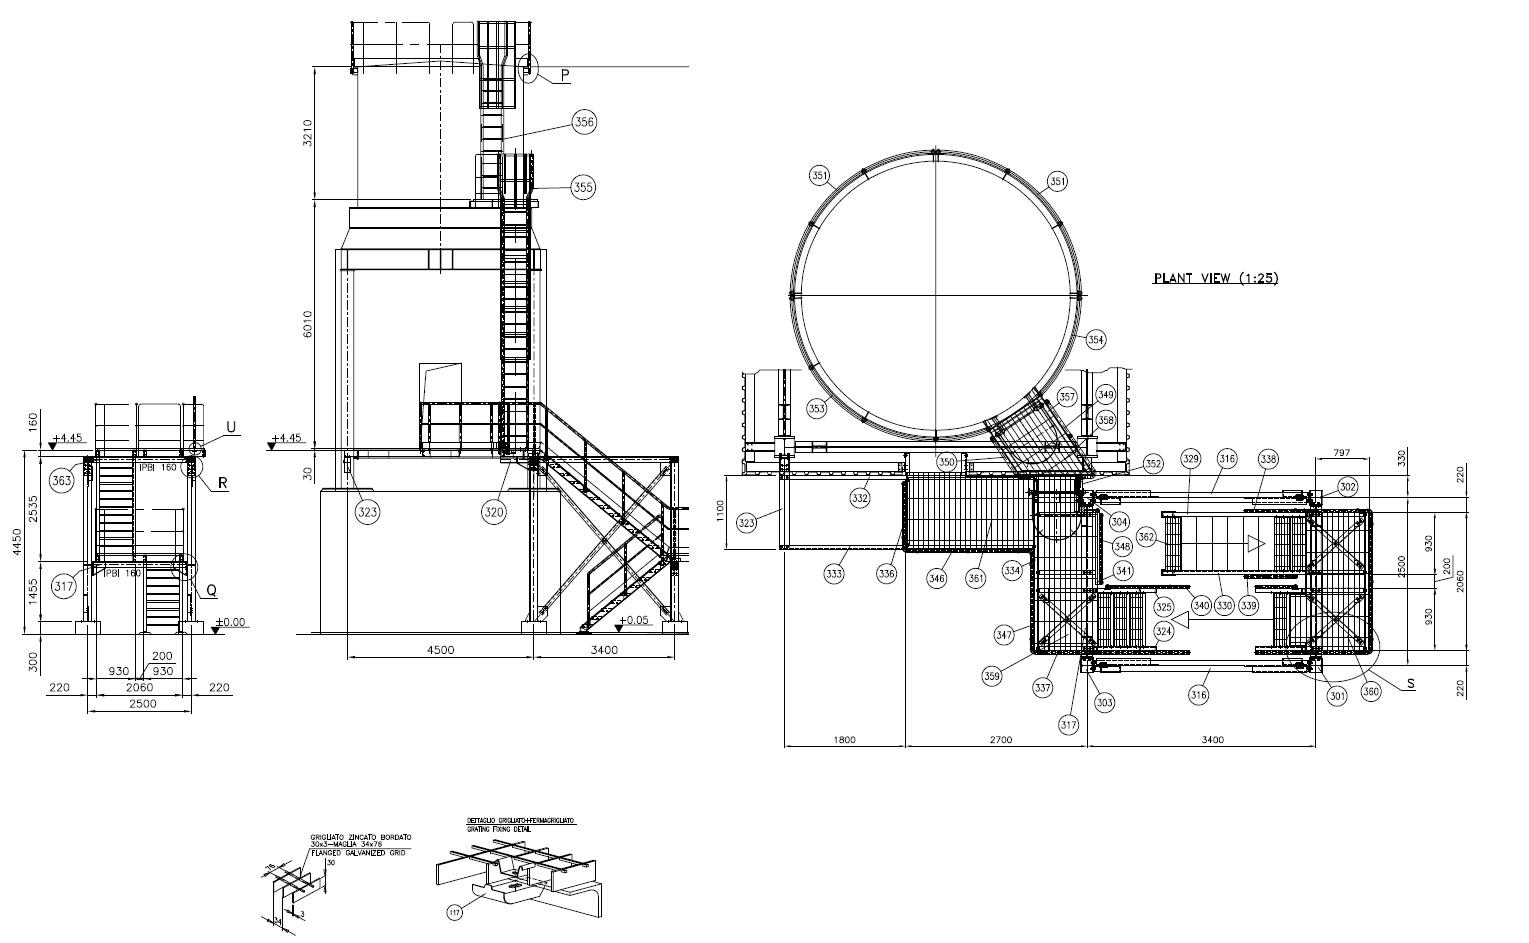 BIM MEP Design Services: CAD 3D to 2D Construction Drawings